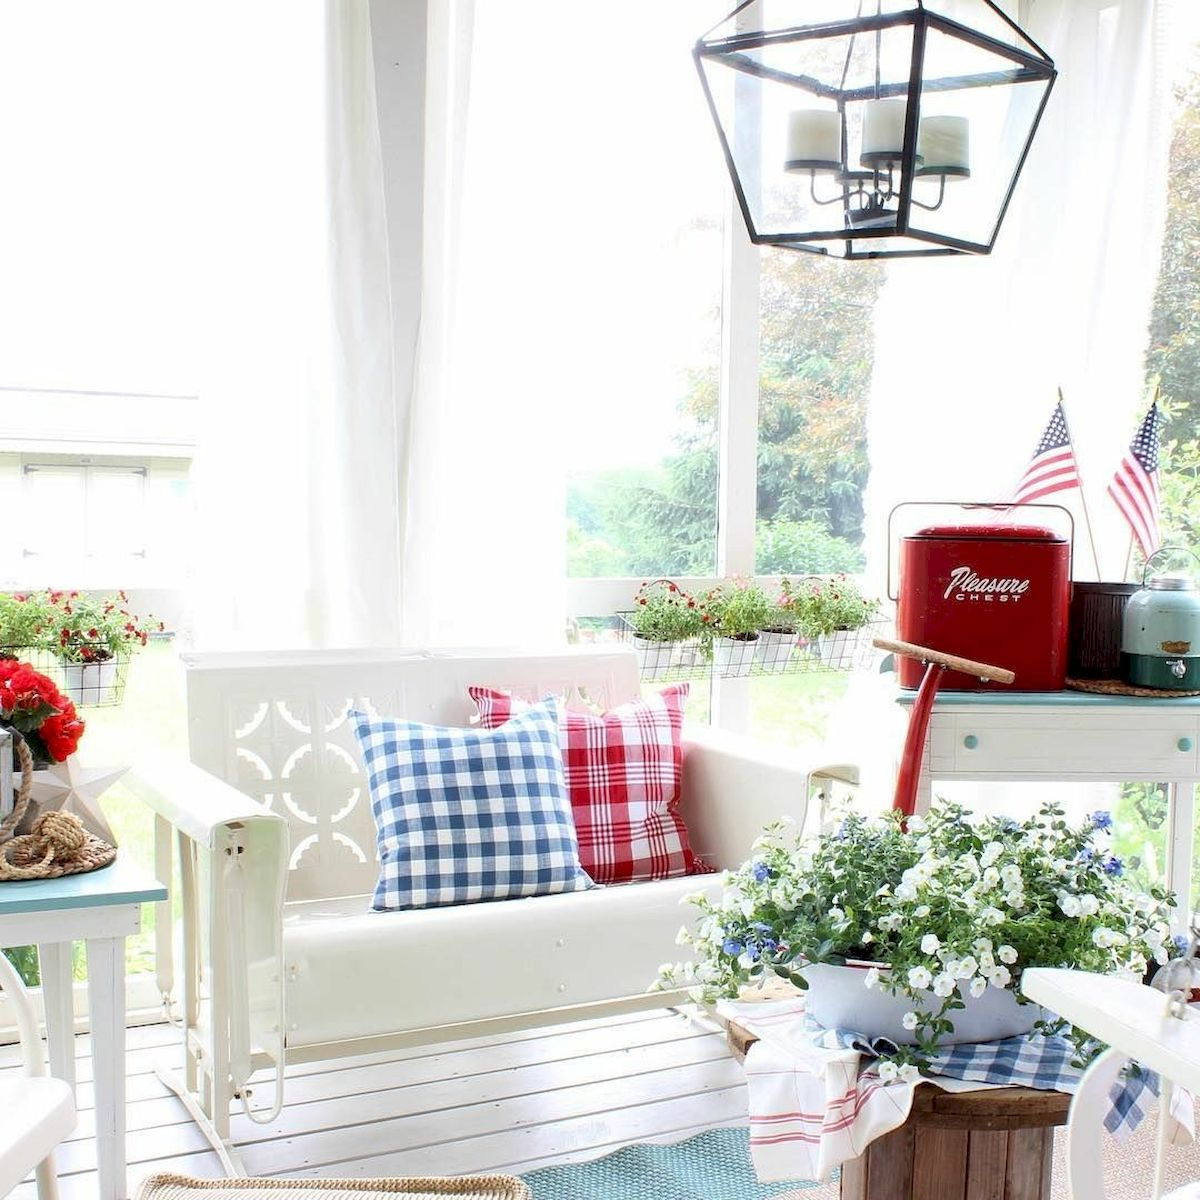 45 Colorful Interior Home Design and Decor Ideas (9)